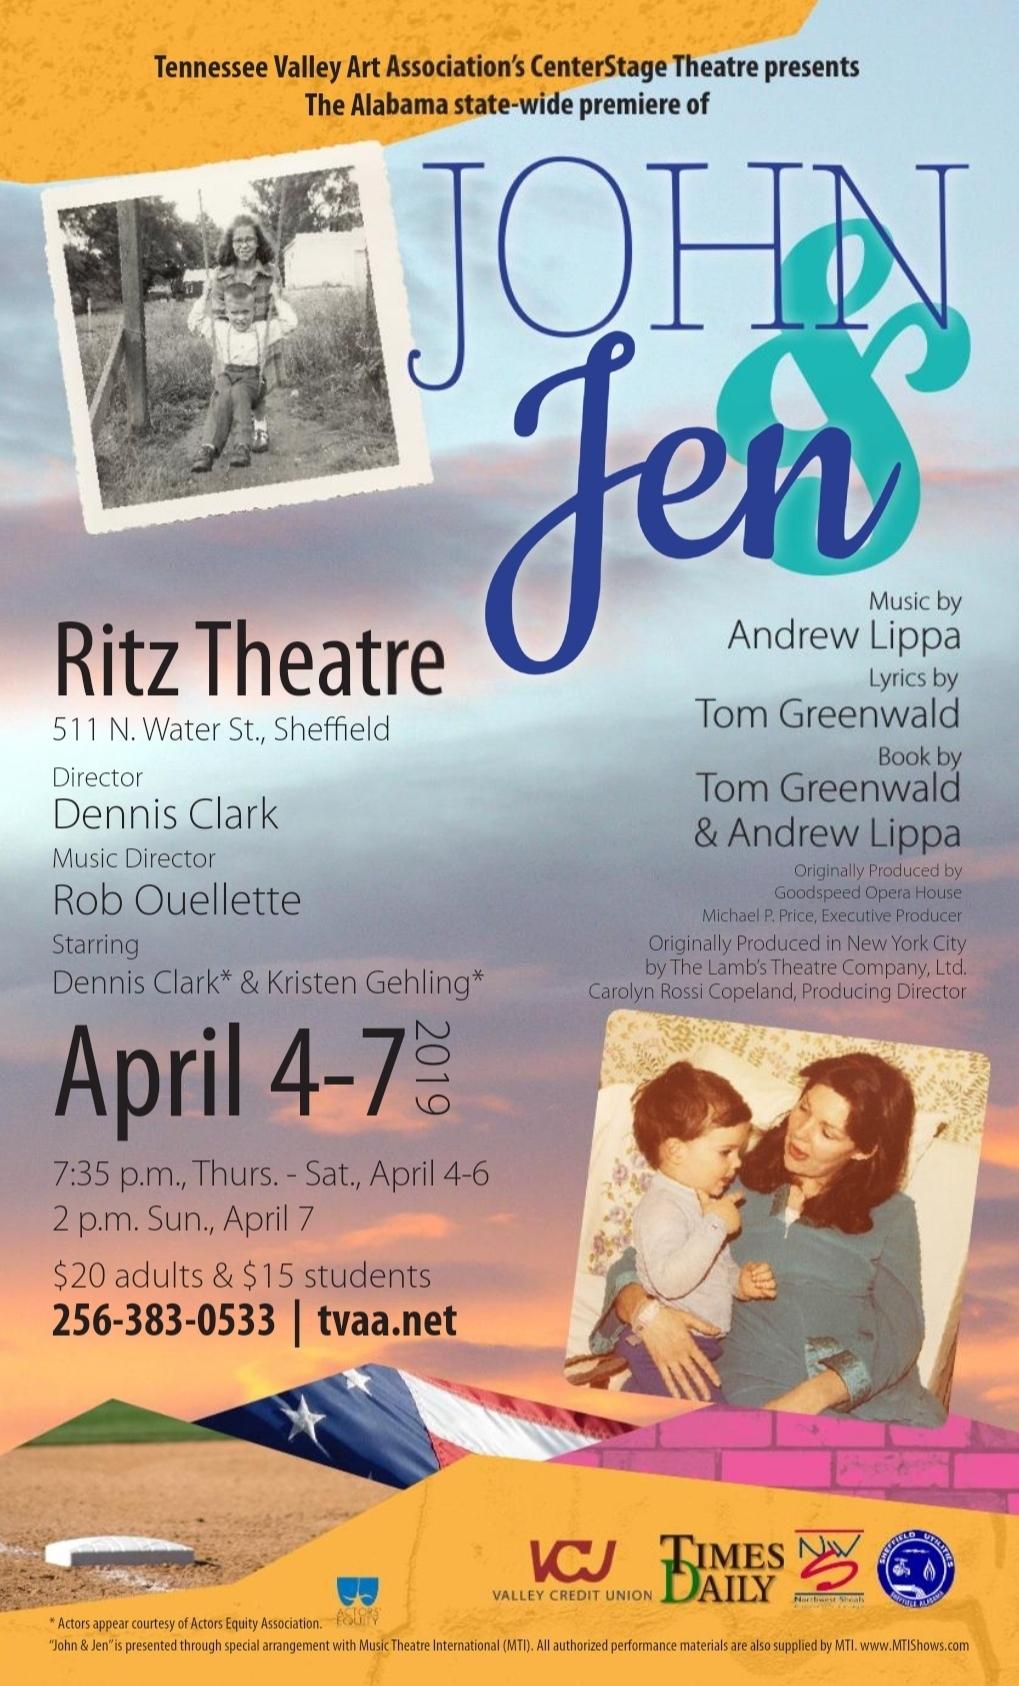 'John and Jen' Musical Opens Ritz Theatre 2019 Season Starring Dennis Clark and Kristen Gehling